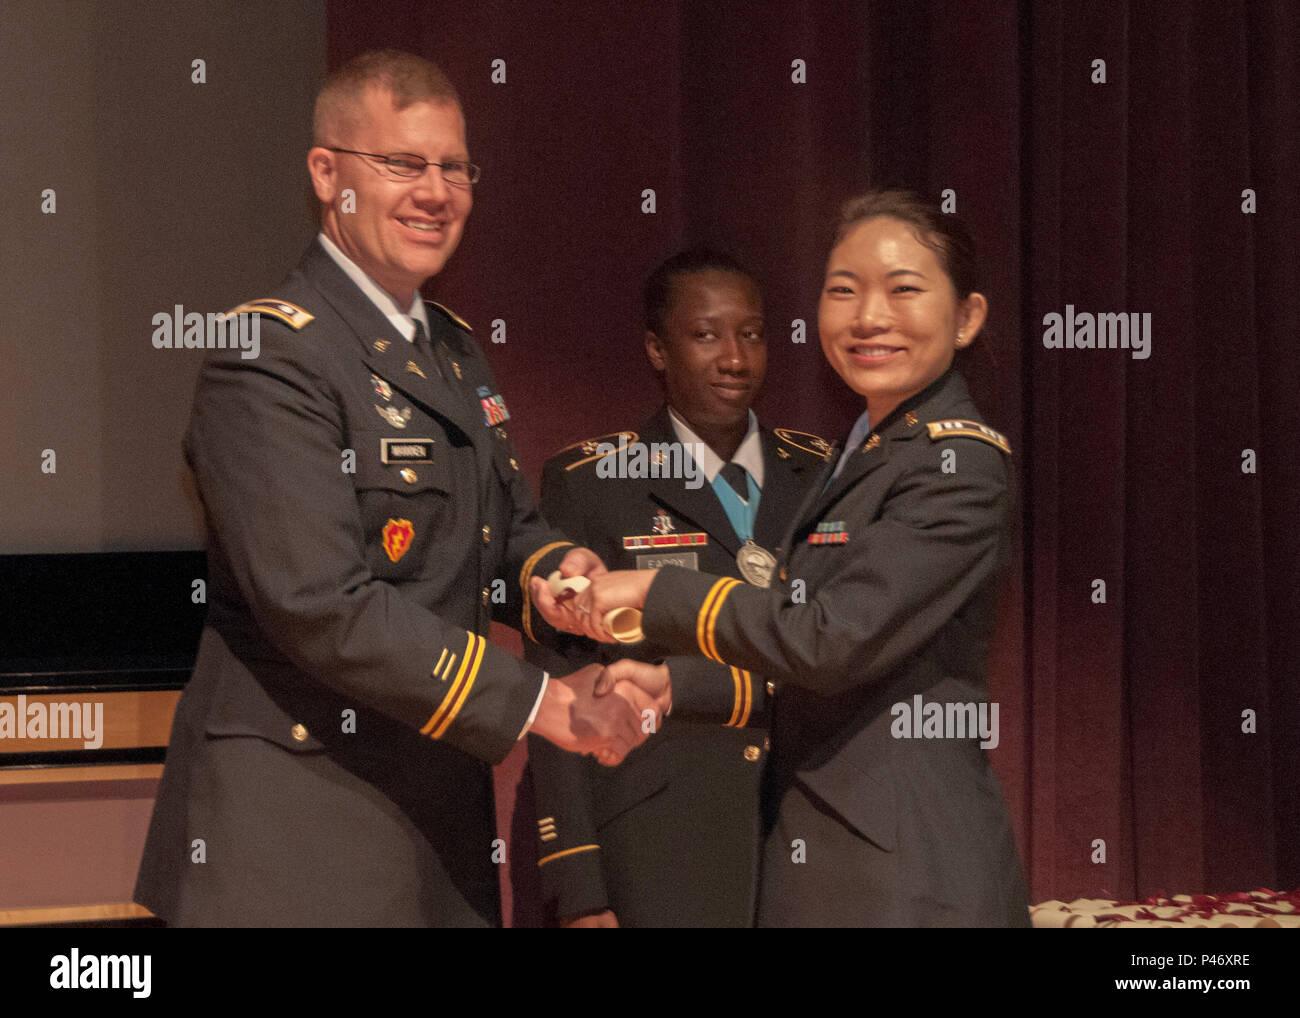 Capt  Tianyi Li (right), a native of New York and graduate